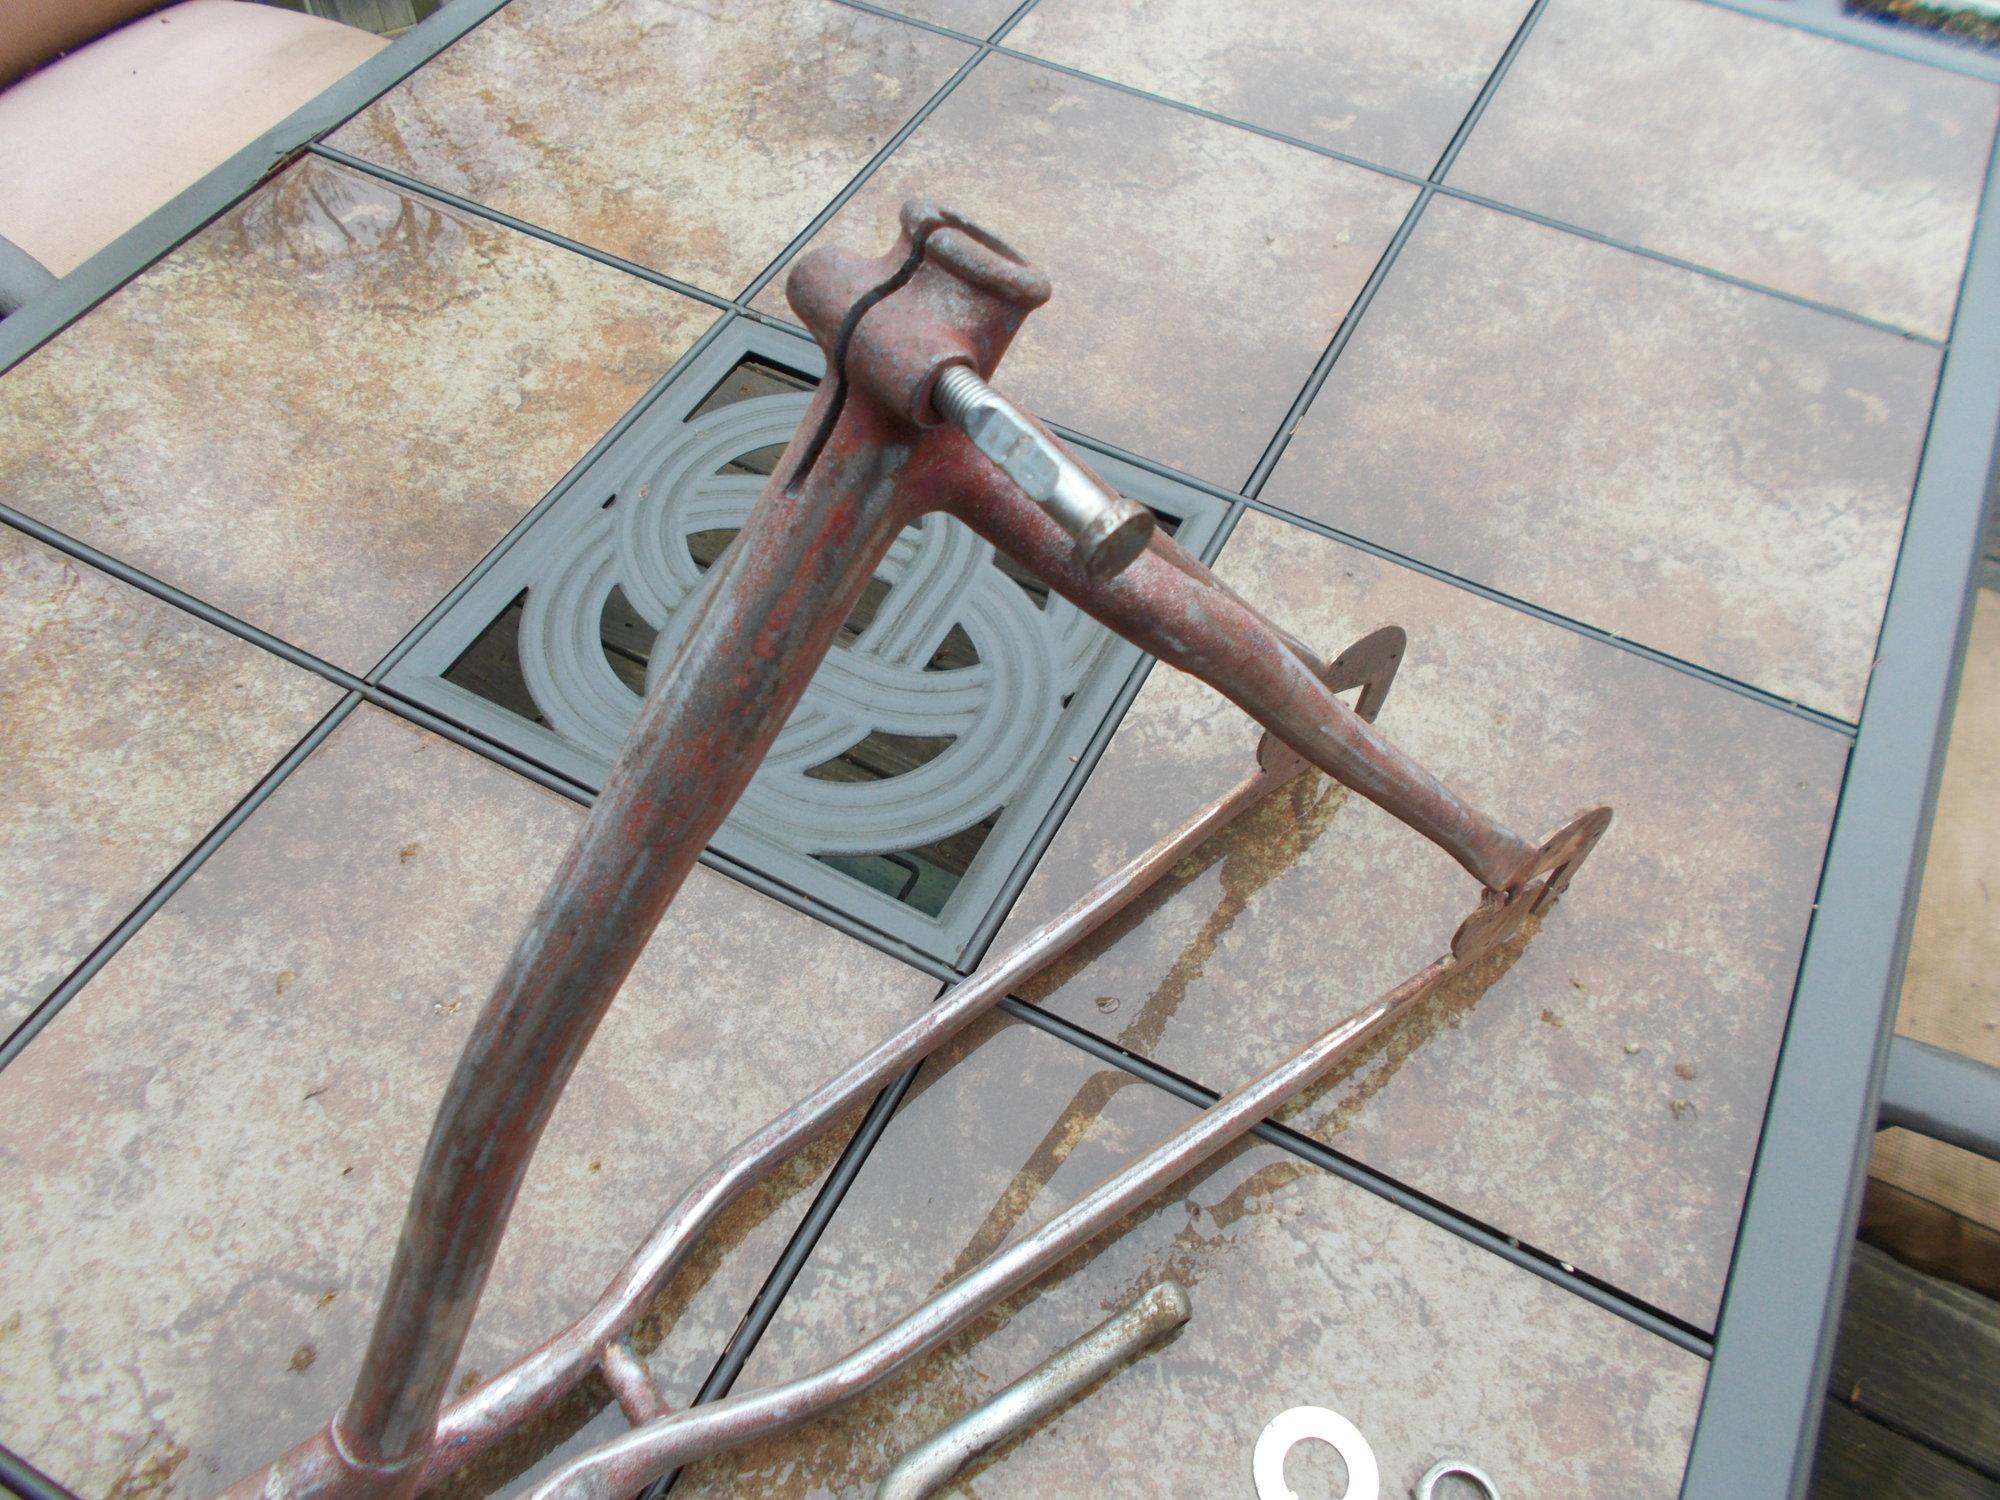 cabe swap meet parts for sale 021.JPG